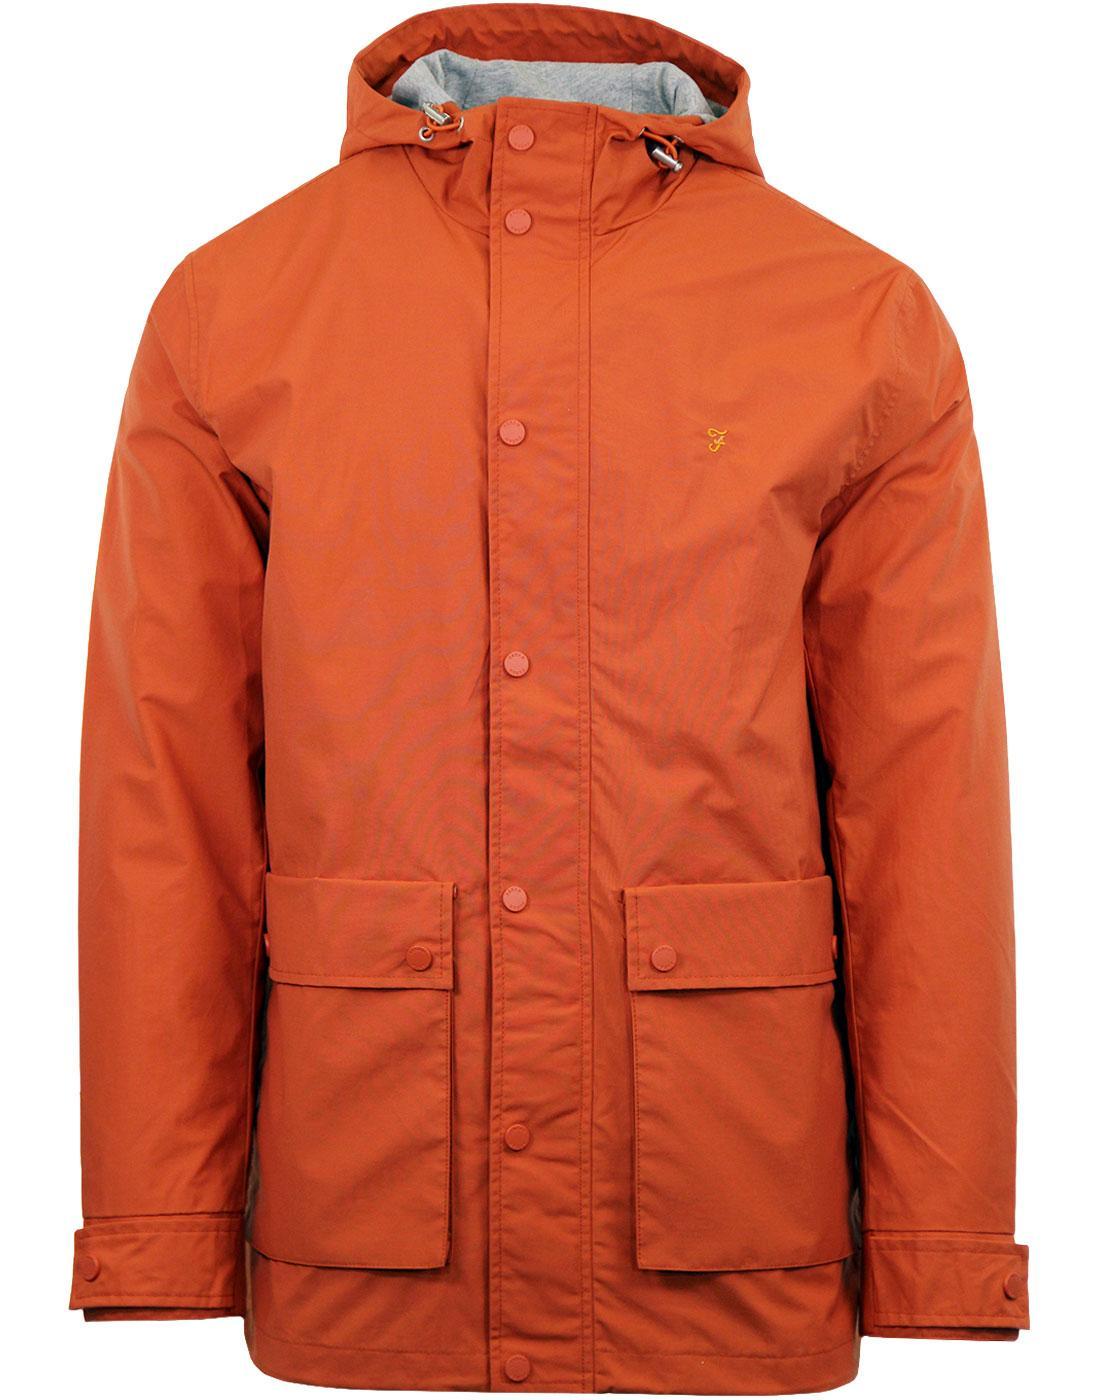 Rourke FARAH Retro 60s Showerproof Hooded Jacket O